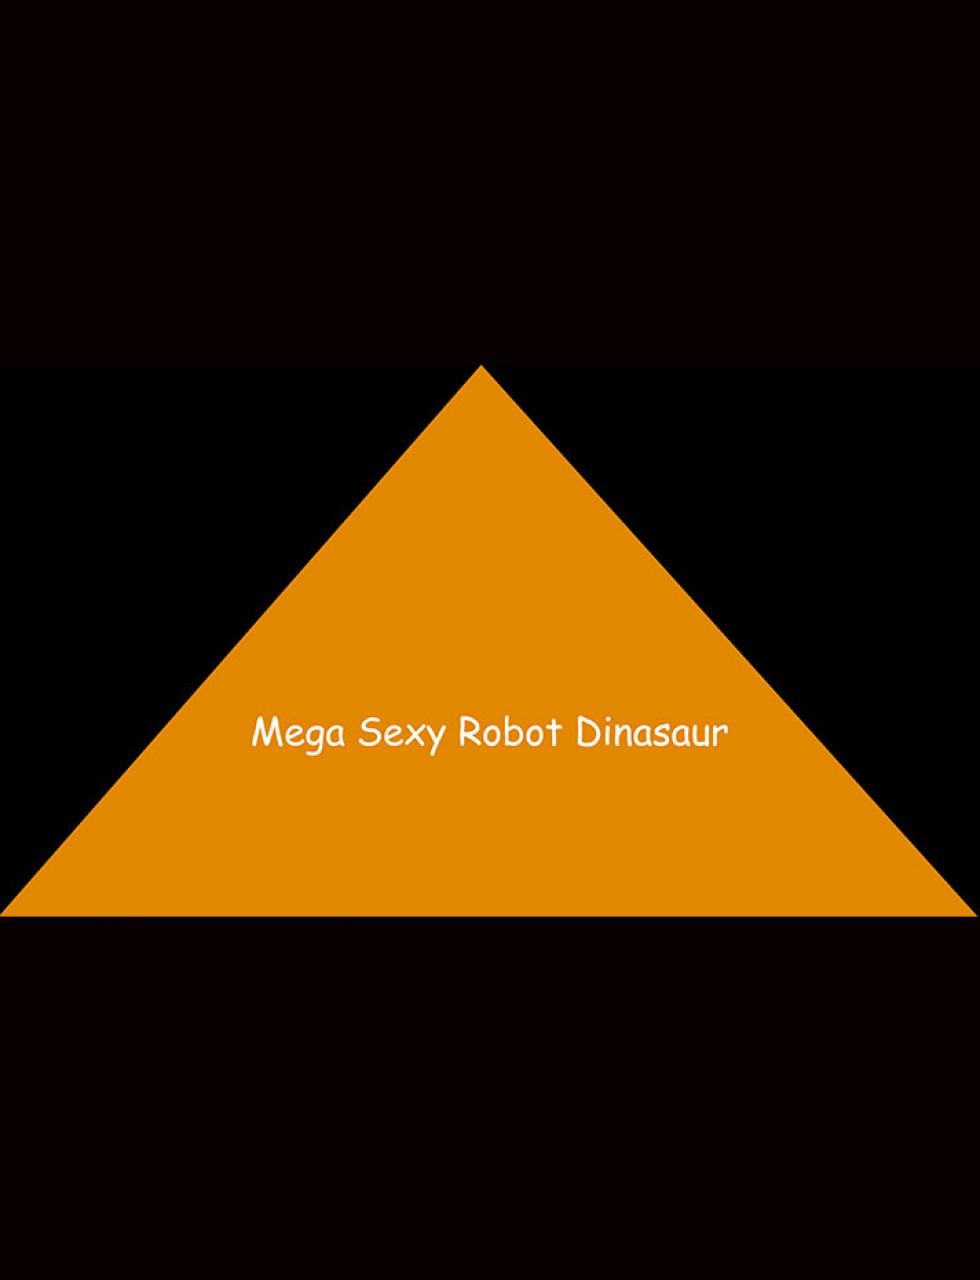 Mega Sexy Robot Dinosaur